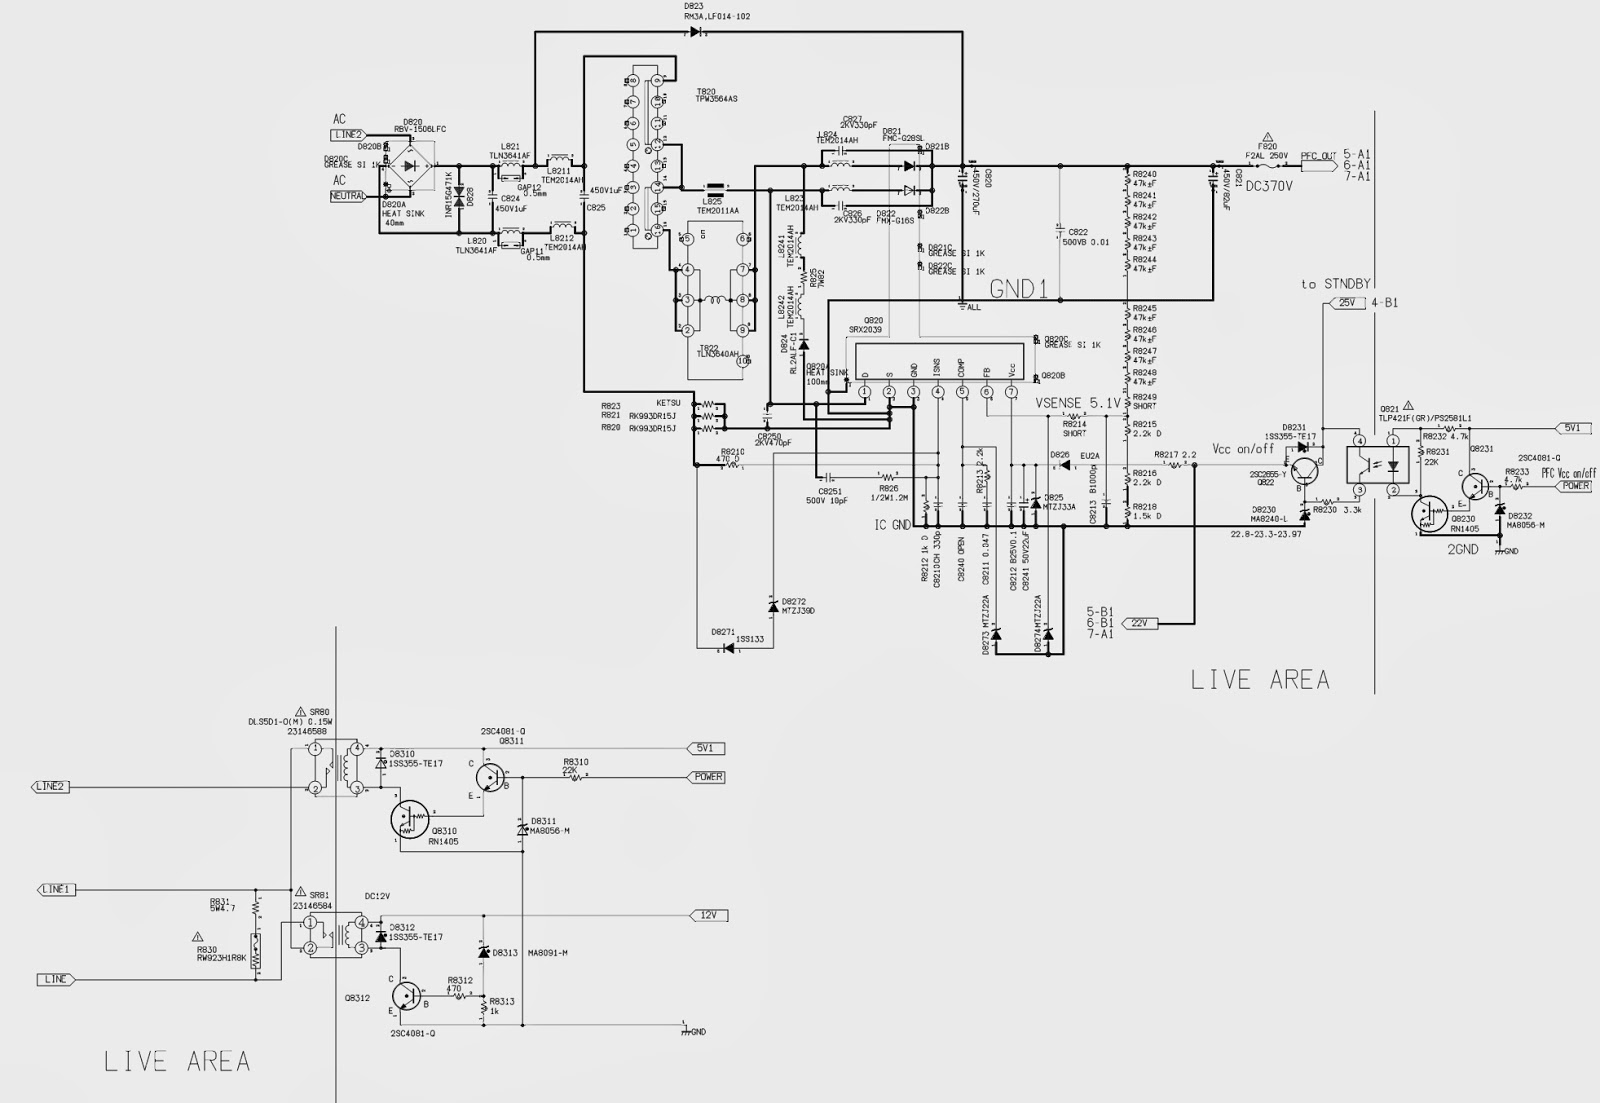 small resolution of toshiba 32 37 42wl58 series lcd tvs power supply schematics lcd tvs power supply schematics circuit diagram str